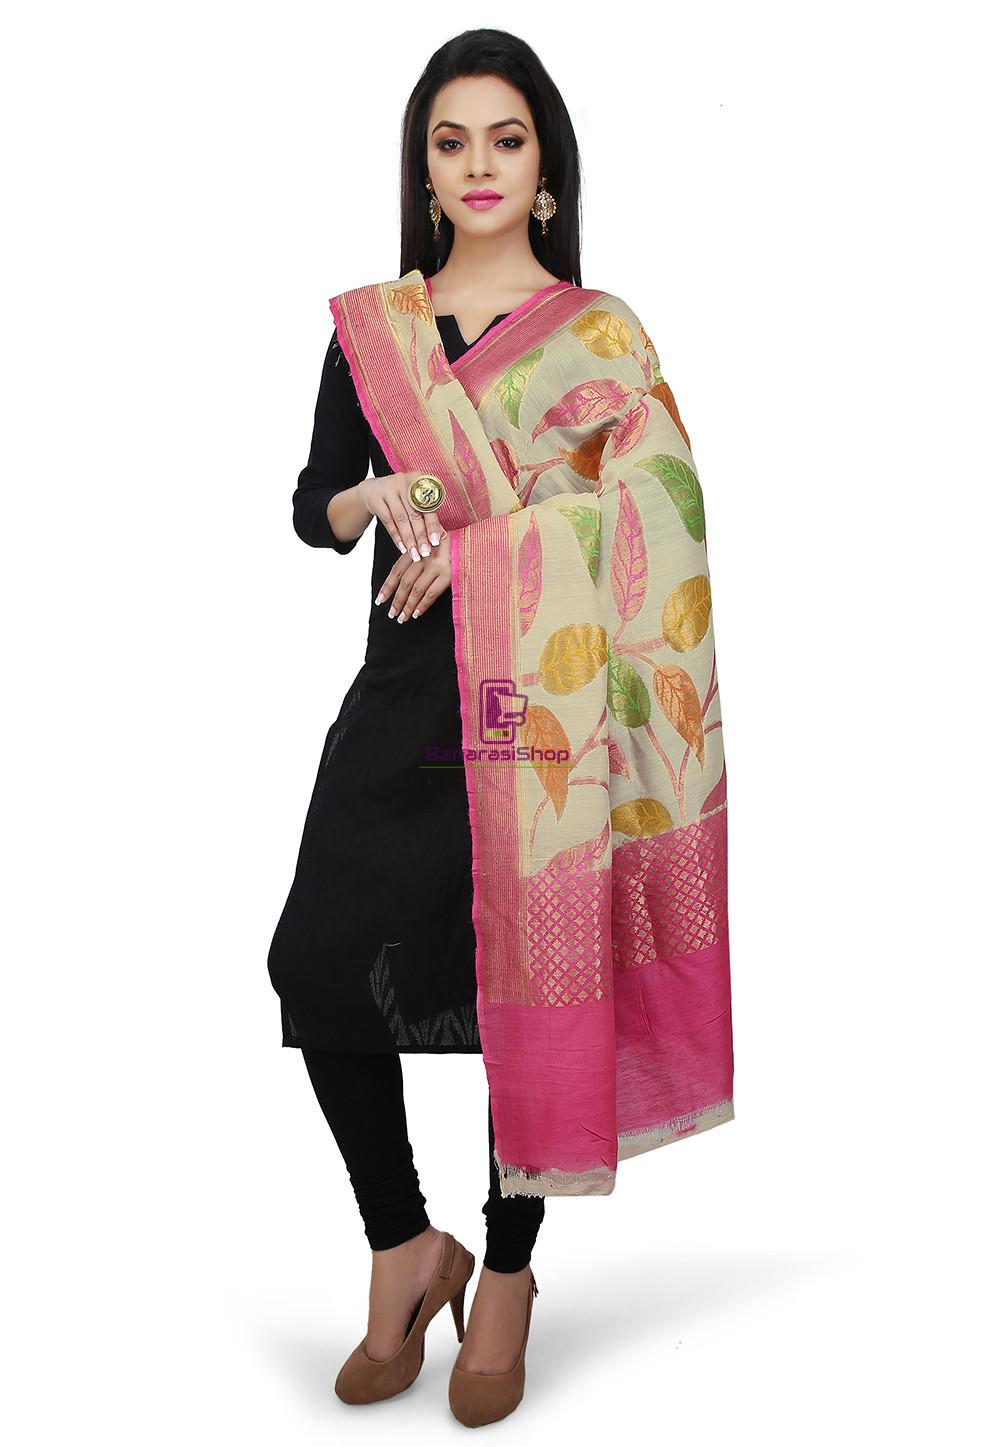 Handloom Banarasi Pure Muga Silk Dupatta in Light Beige and Pink 1